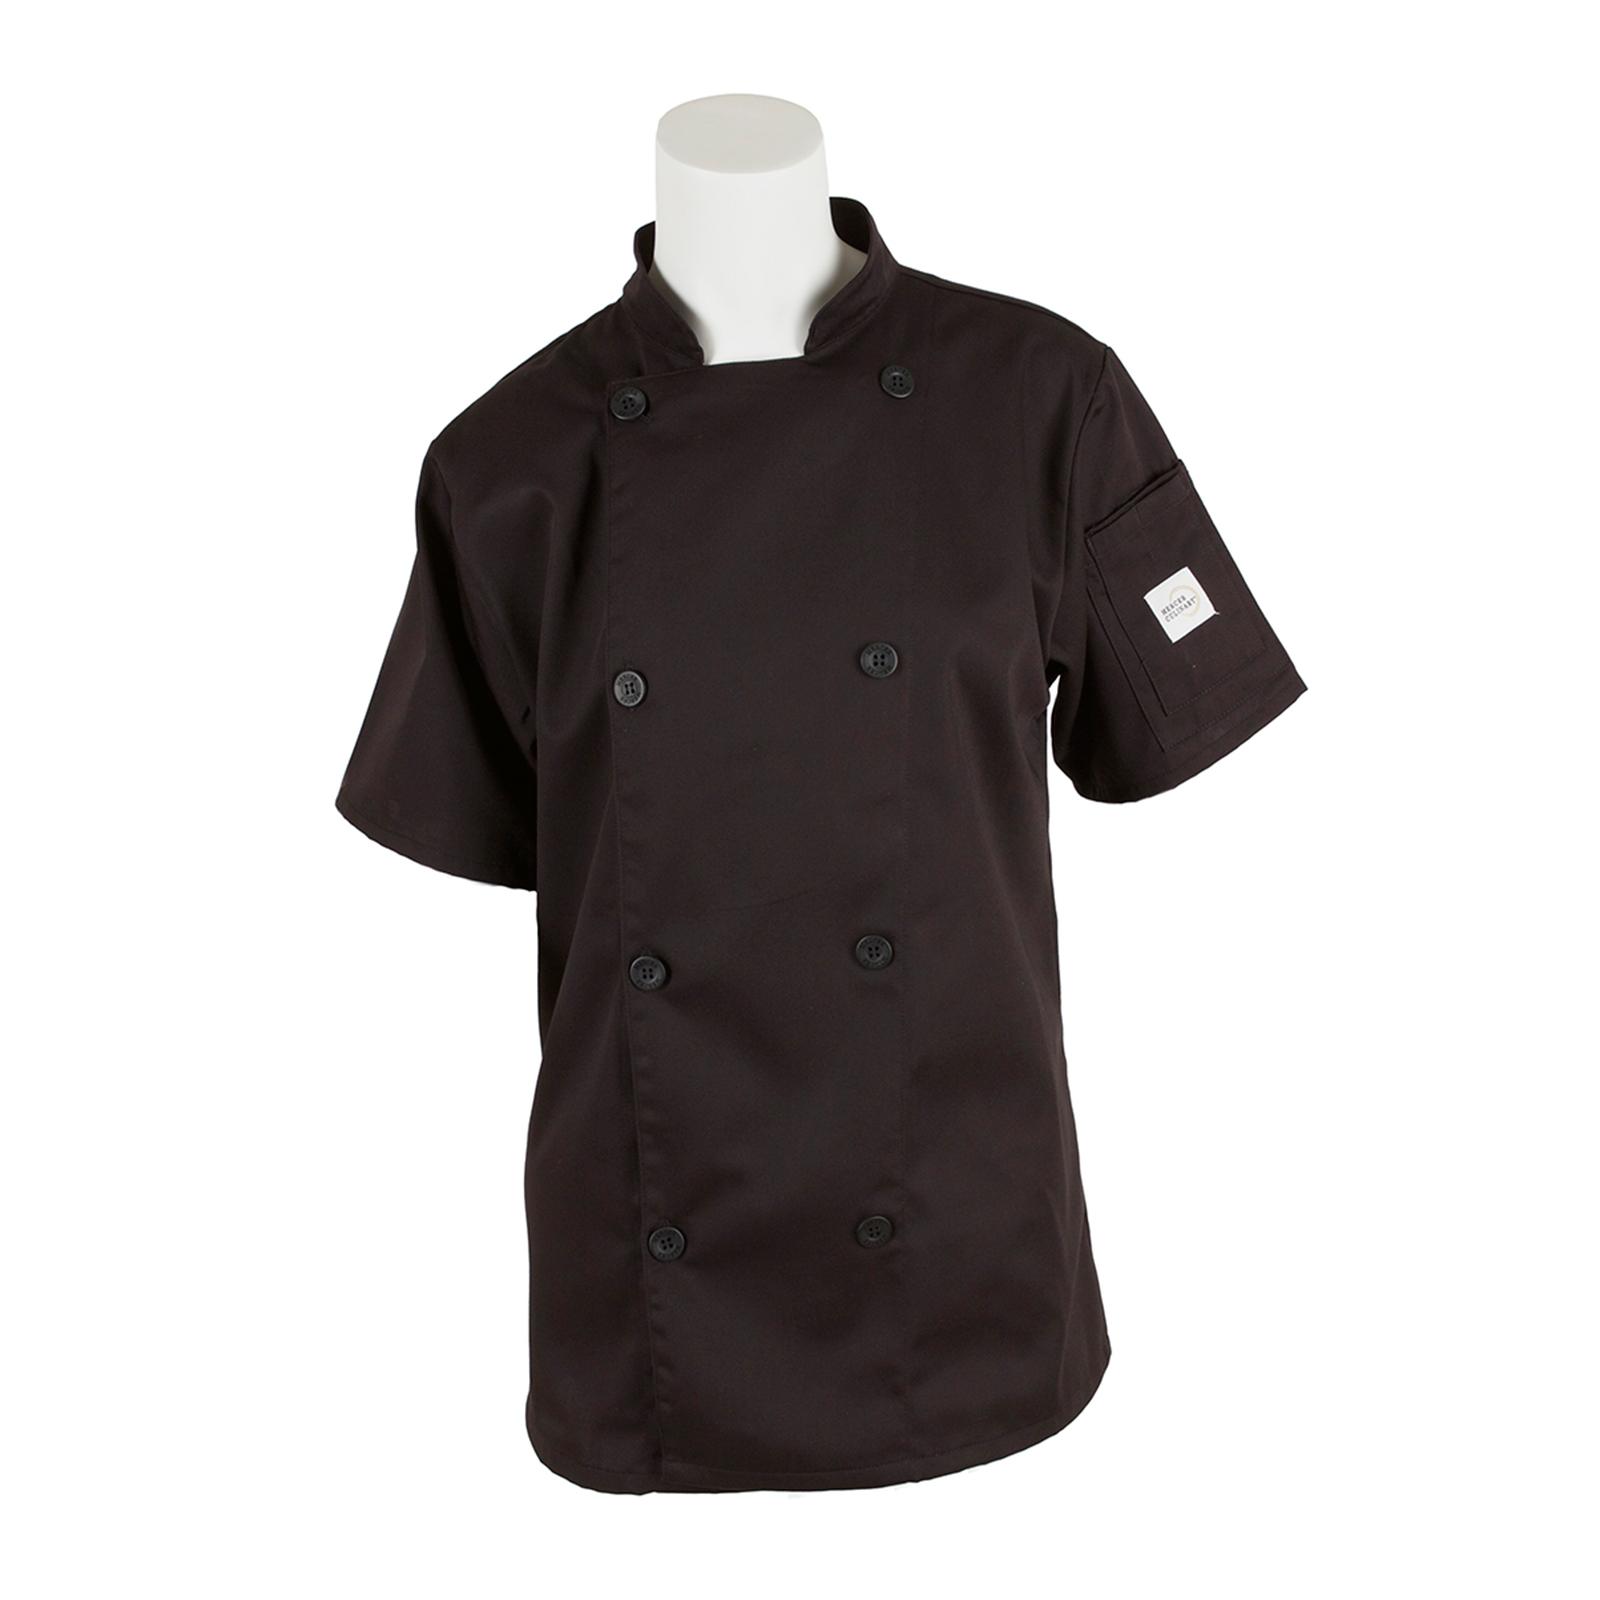 Mercer Culinary M61032BKXXS chef's coat